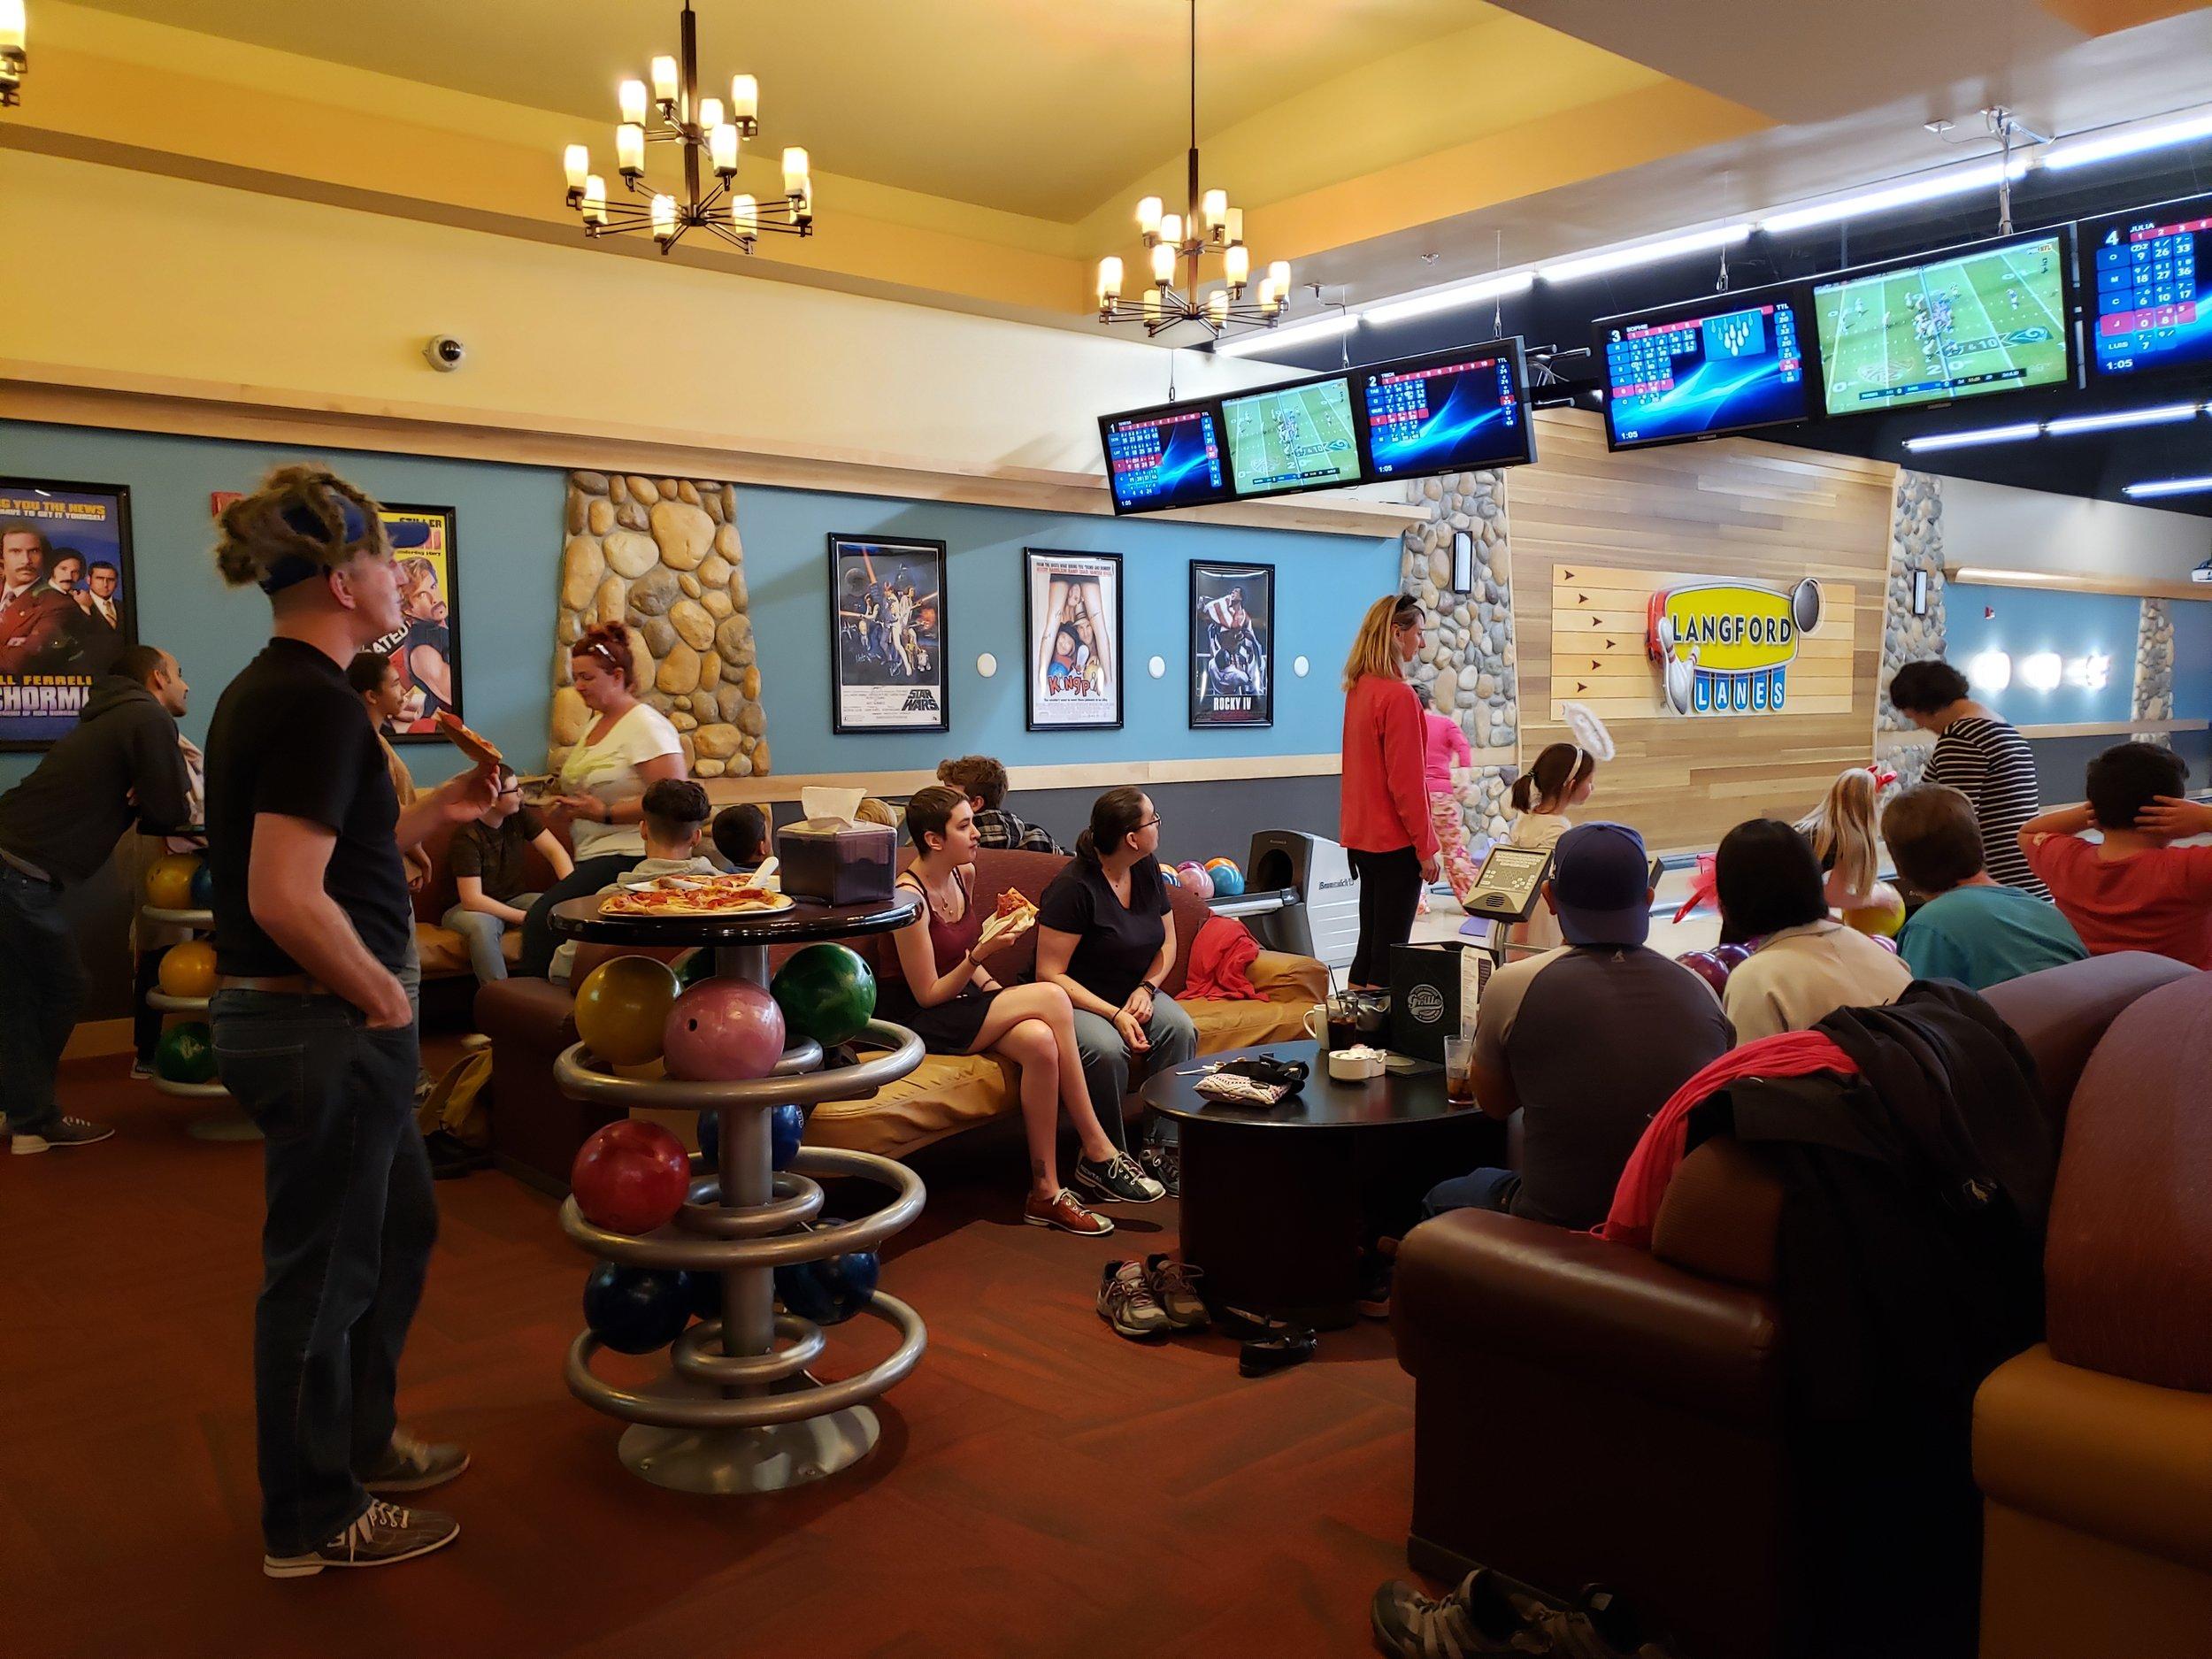 langford bowling pic.jpg